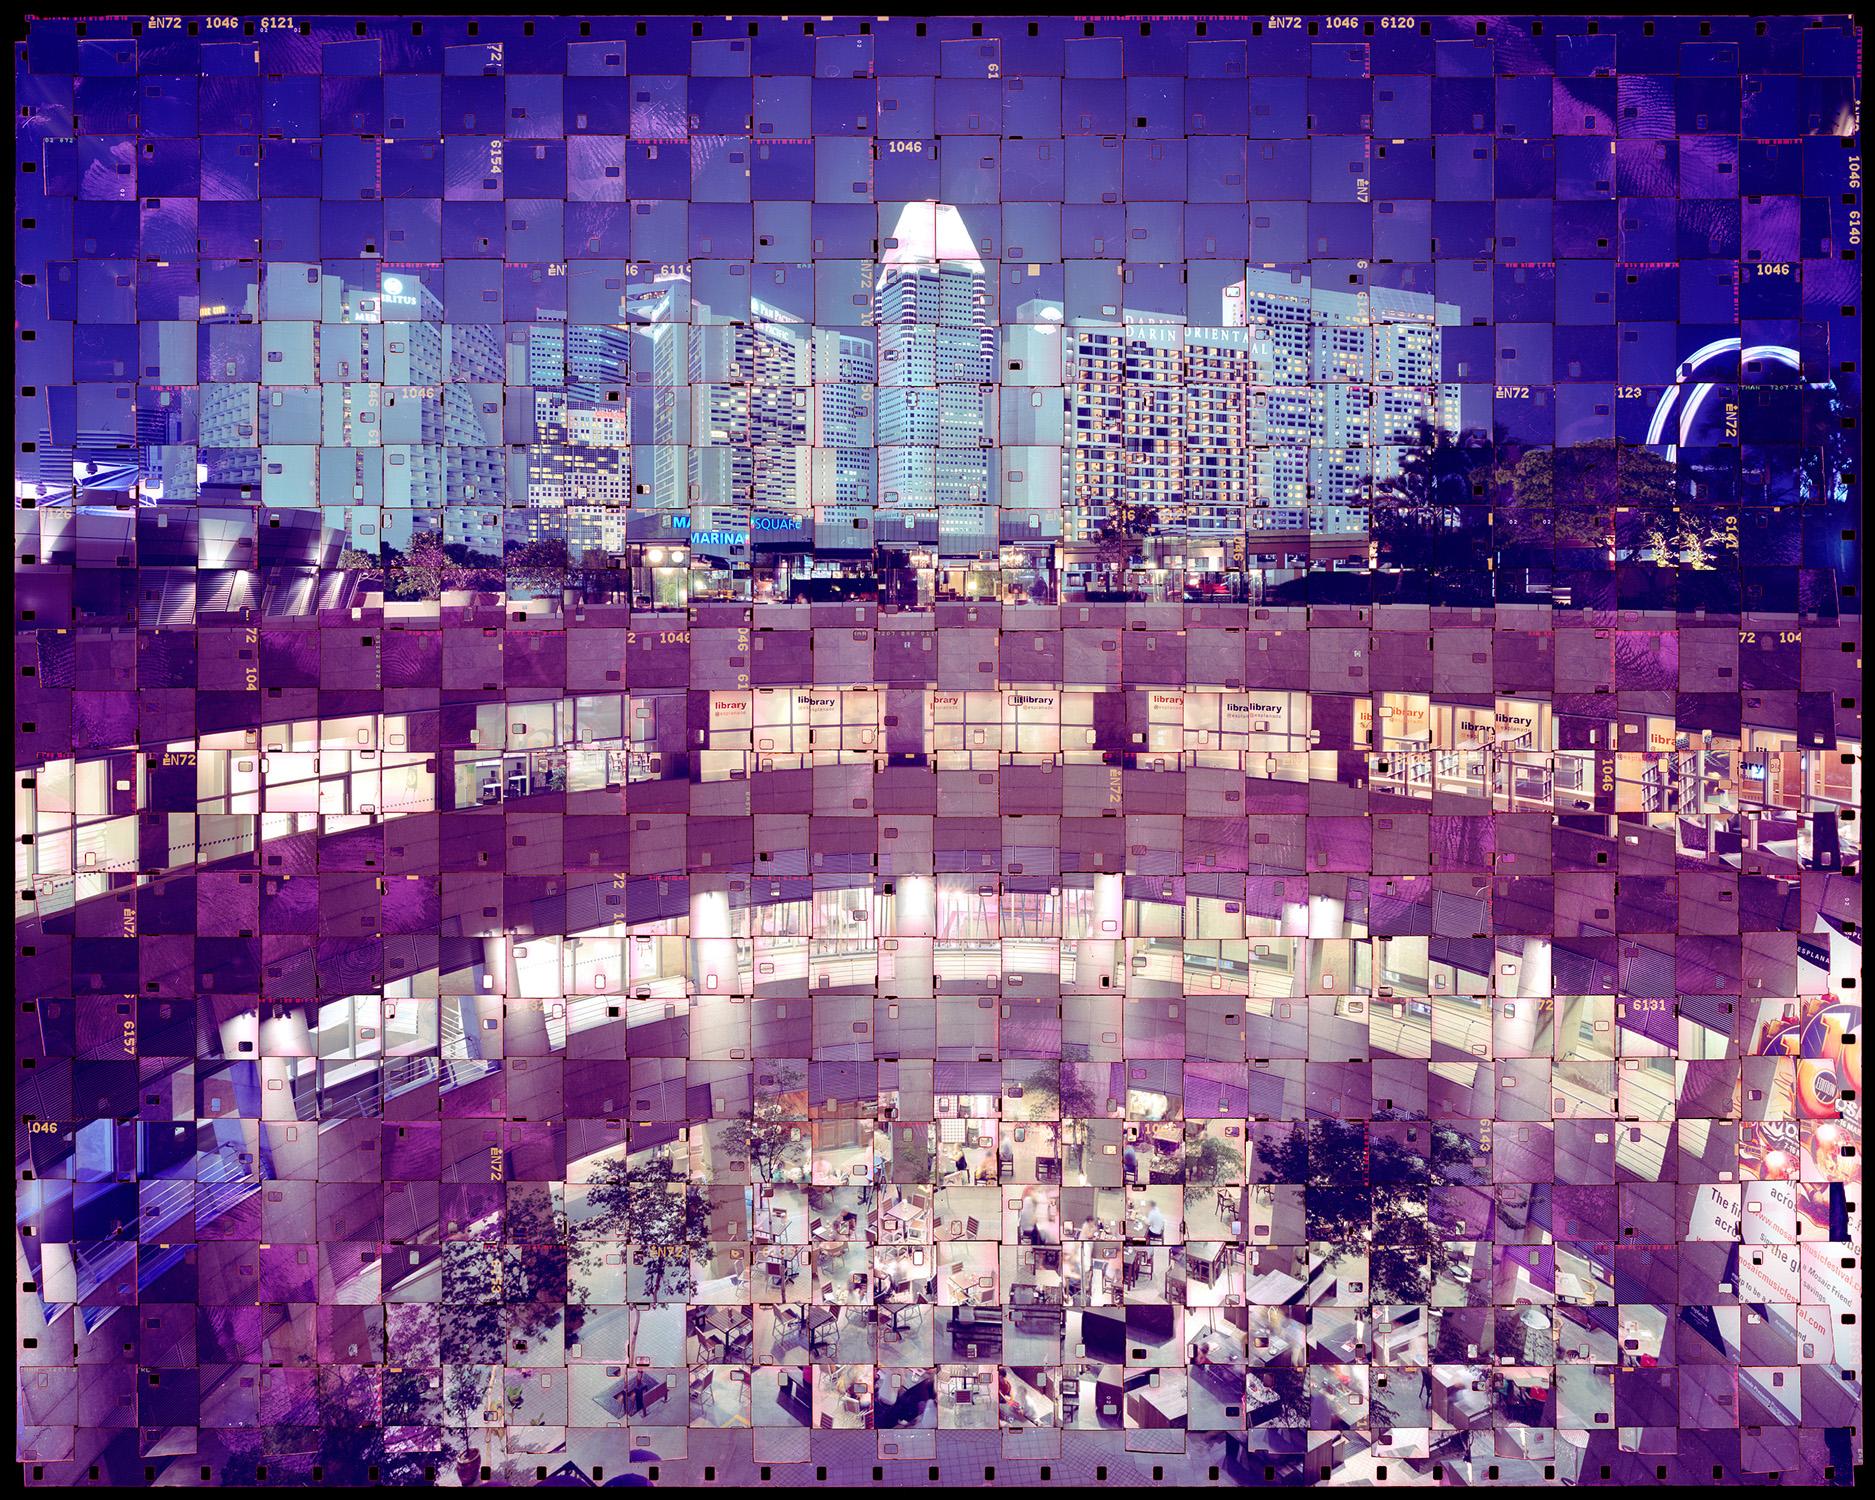 Parkseunghoon_TEXTUS 193-1 Esplanade Singapore _Digital C Print_150cmx120cm_2015 re.jpg